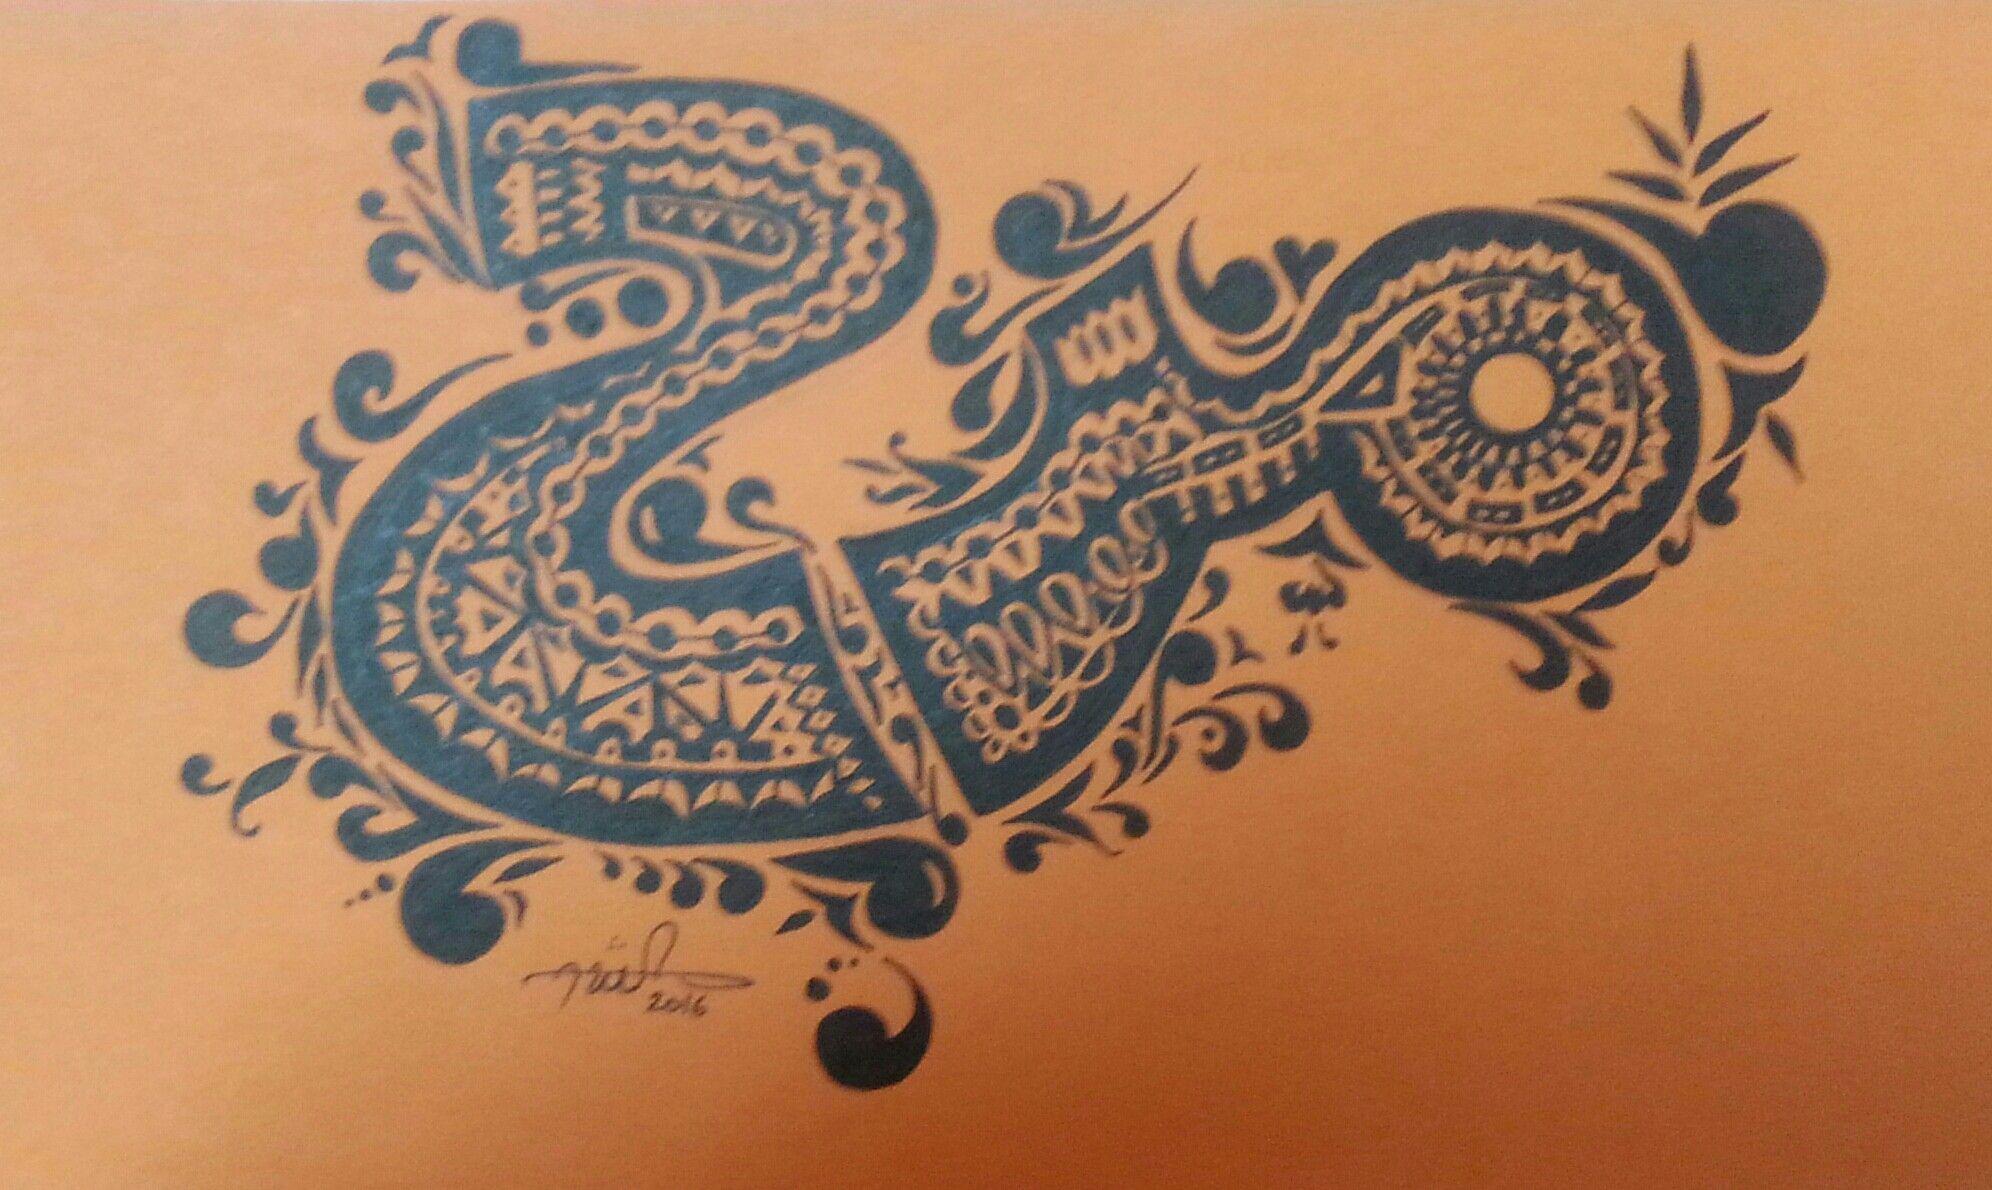 اسم مرح مزخرف Iphone Wallpaper Winter Polynesian Tattoo Iphone Wallpaper